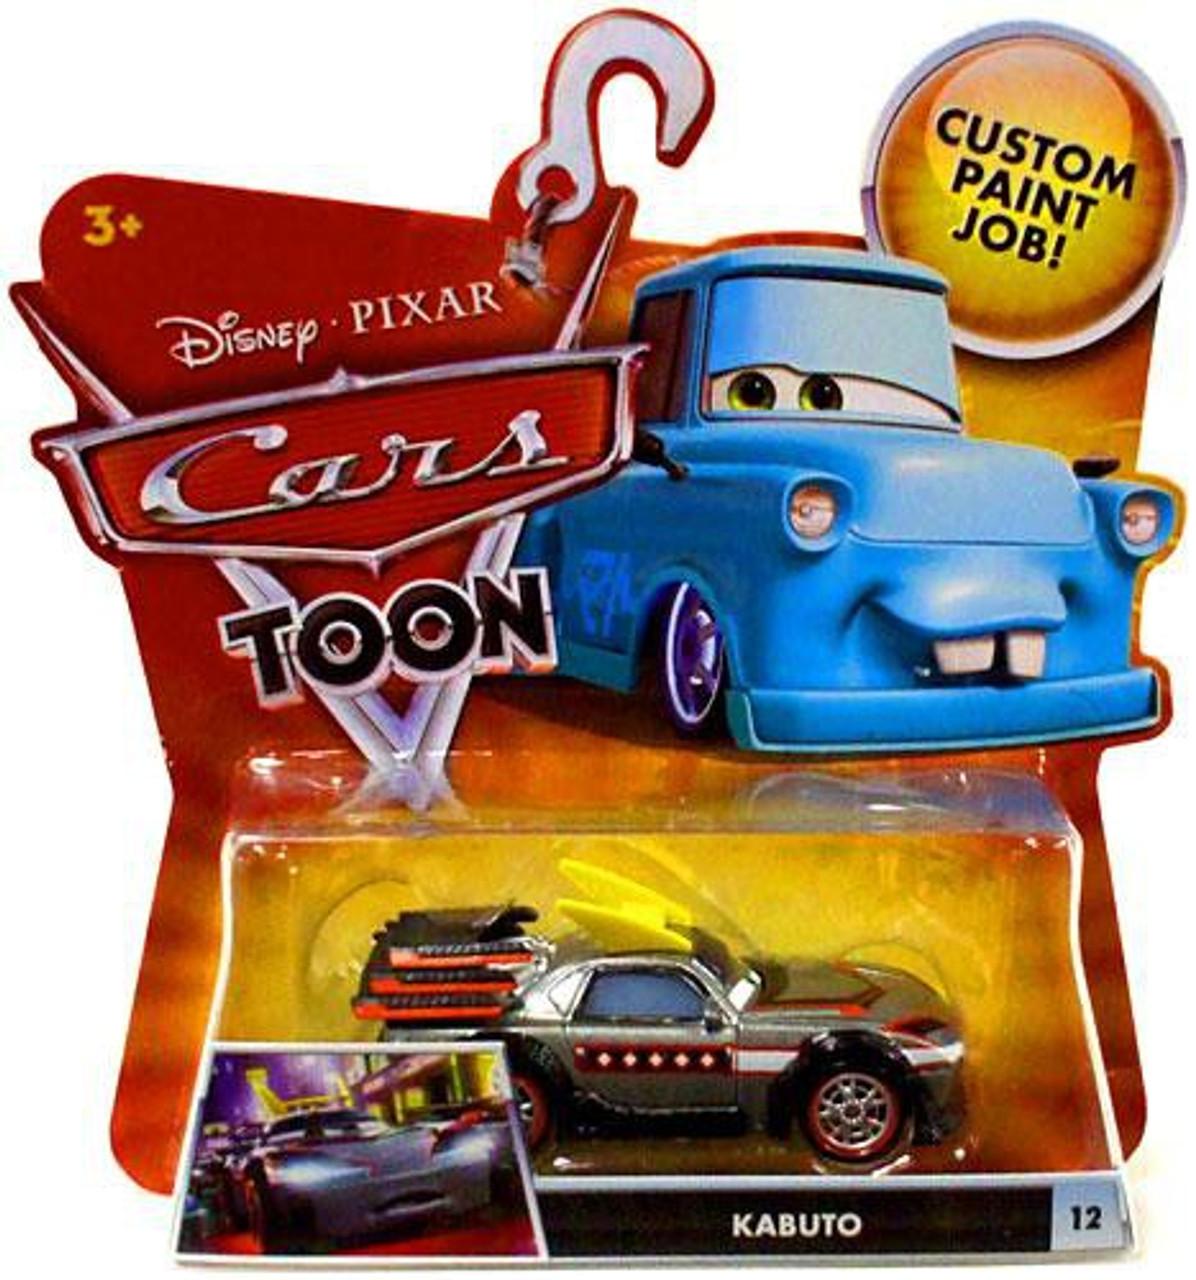 Disney Pixar Cars Mcqueen Racer Rare Characters 3 Toy Car Model 1